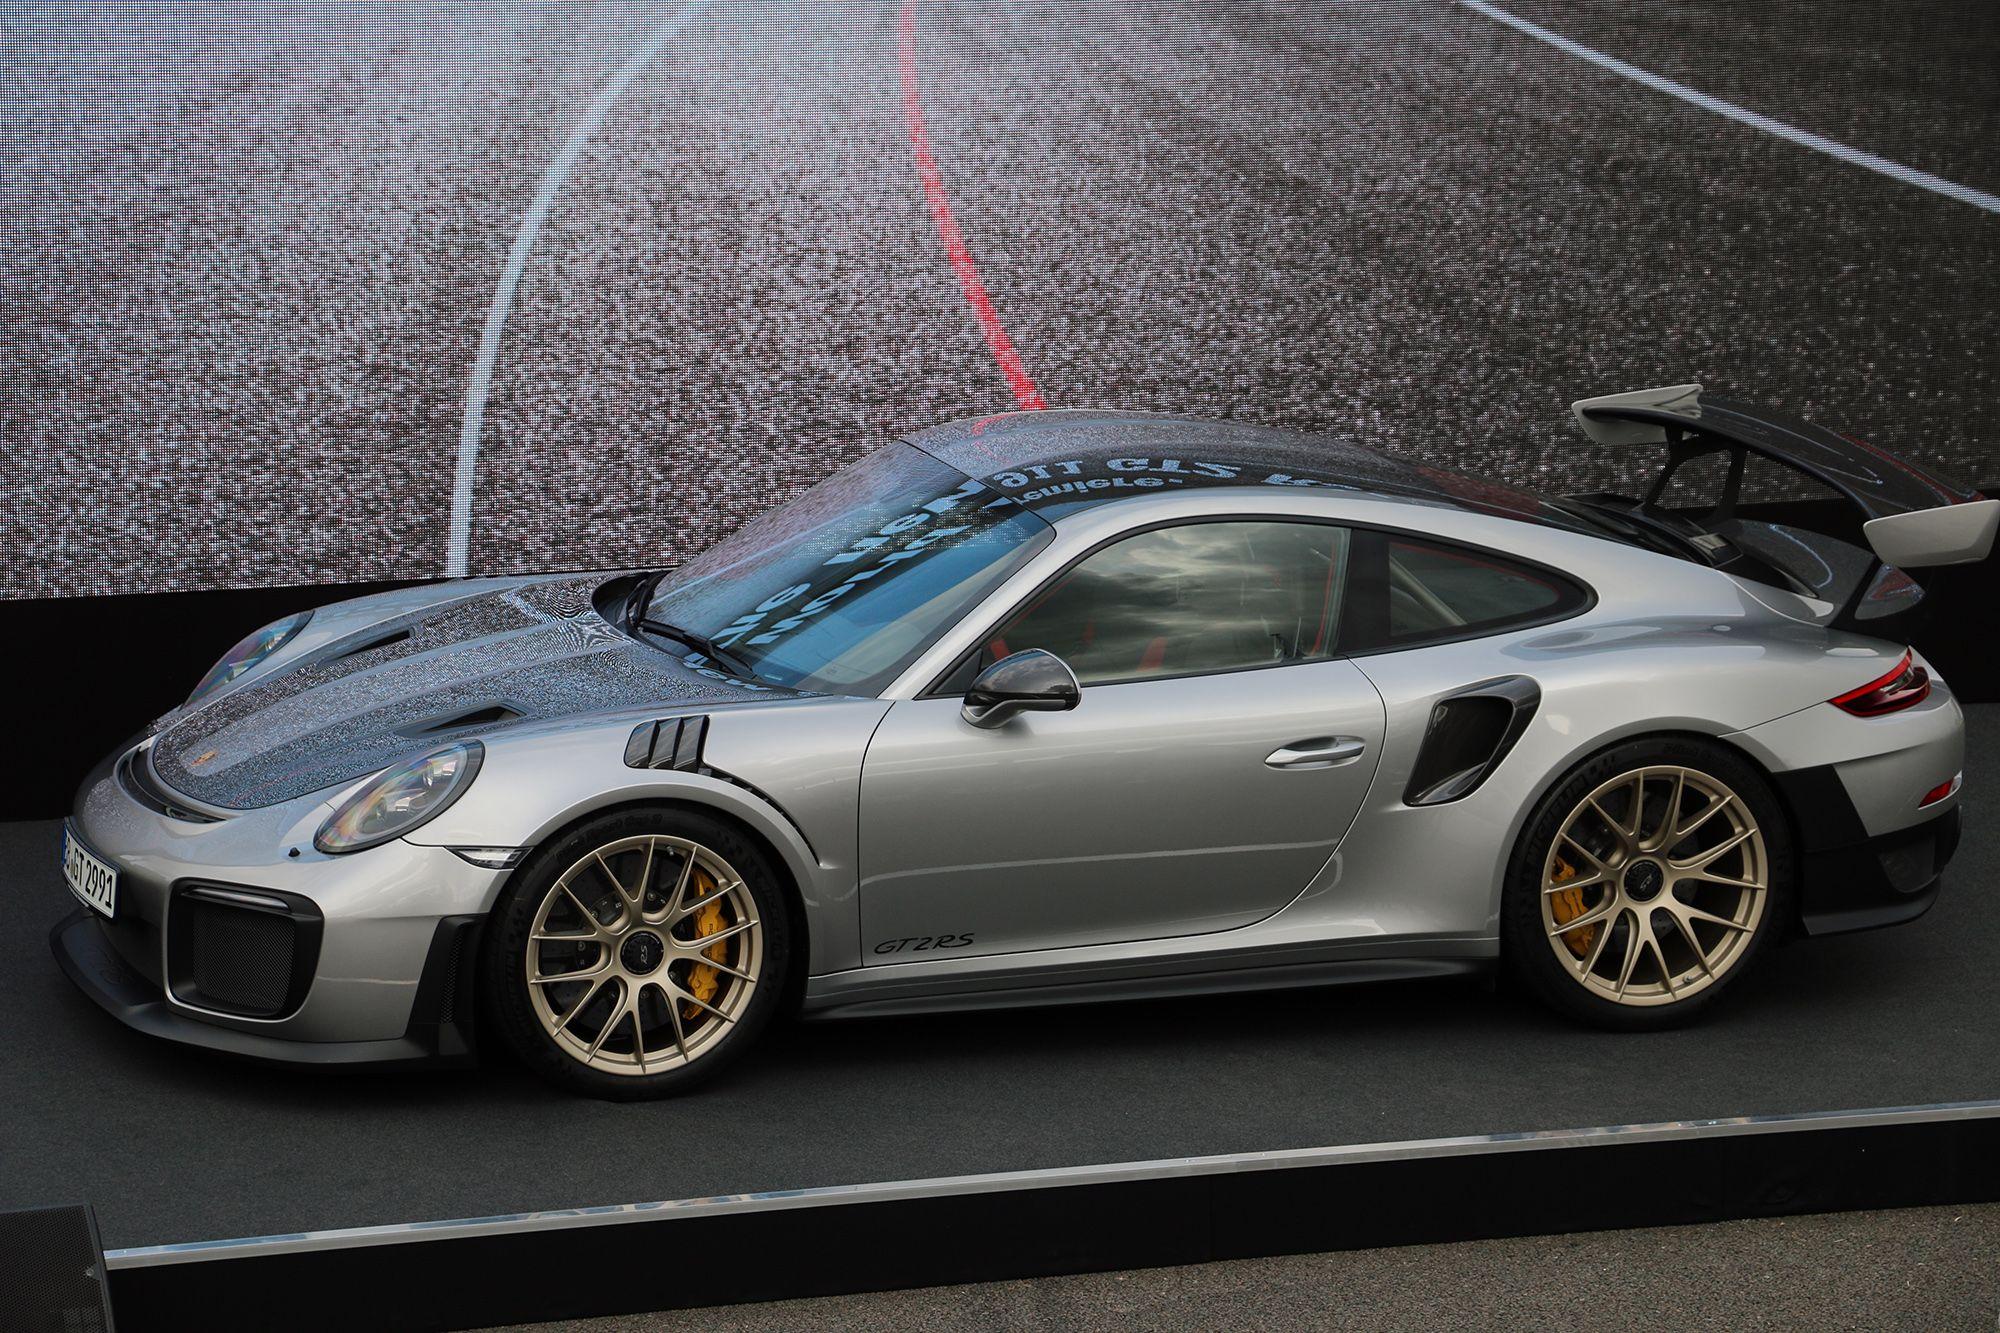 img-6781-jpg-1498843658 Amazing Porsche 911 Gt2 Rs Engine Cars Trend